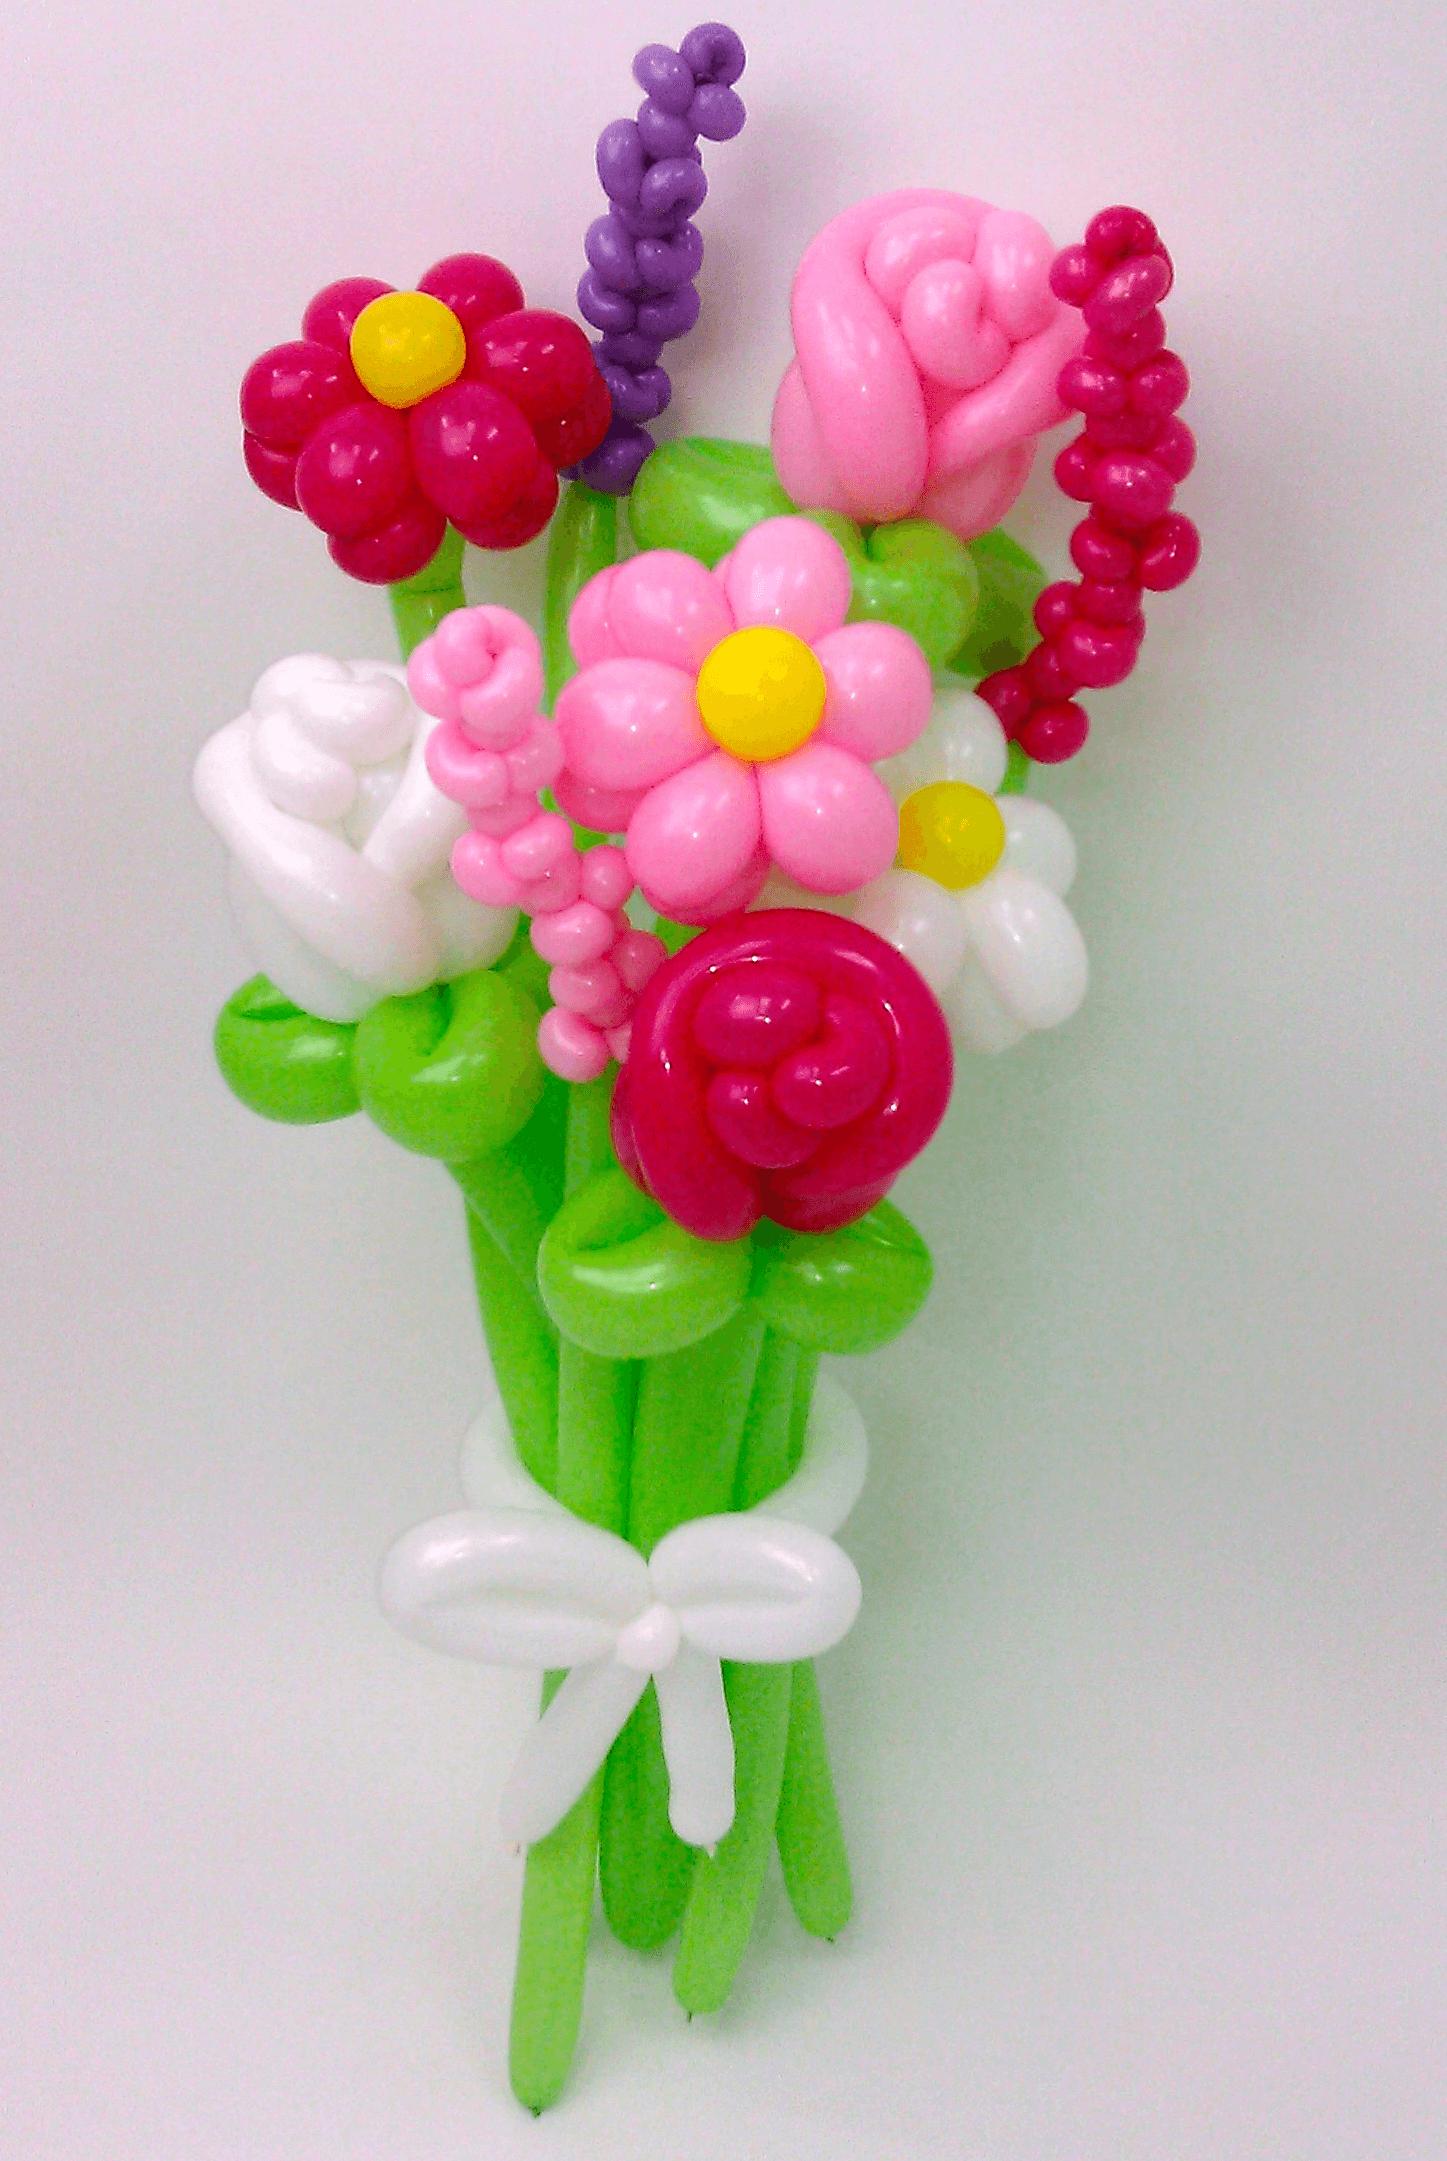 Daisy balloons, flower